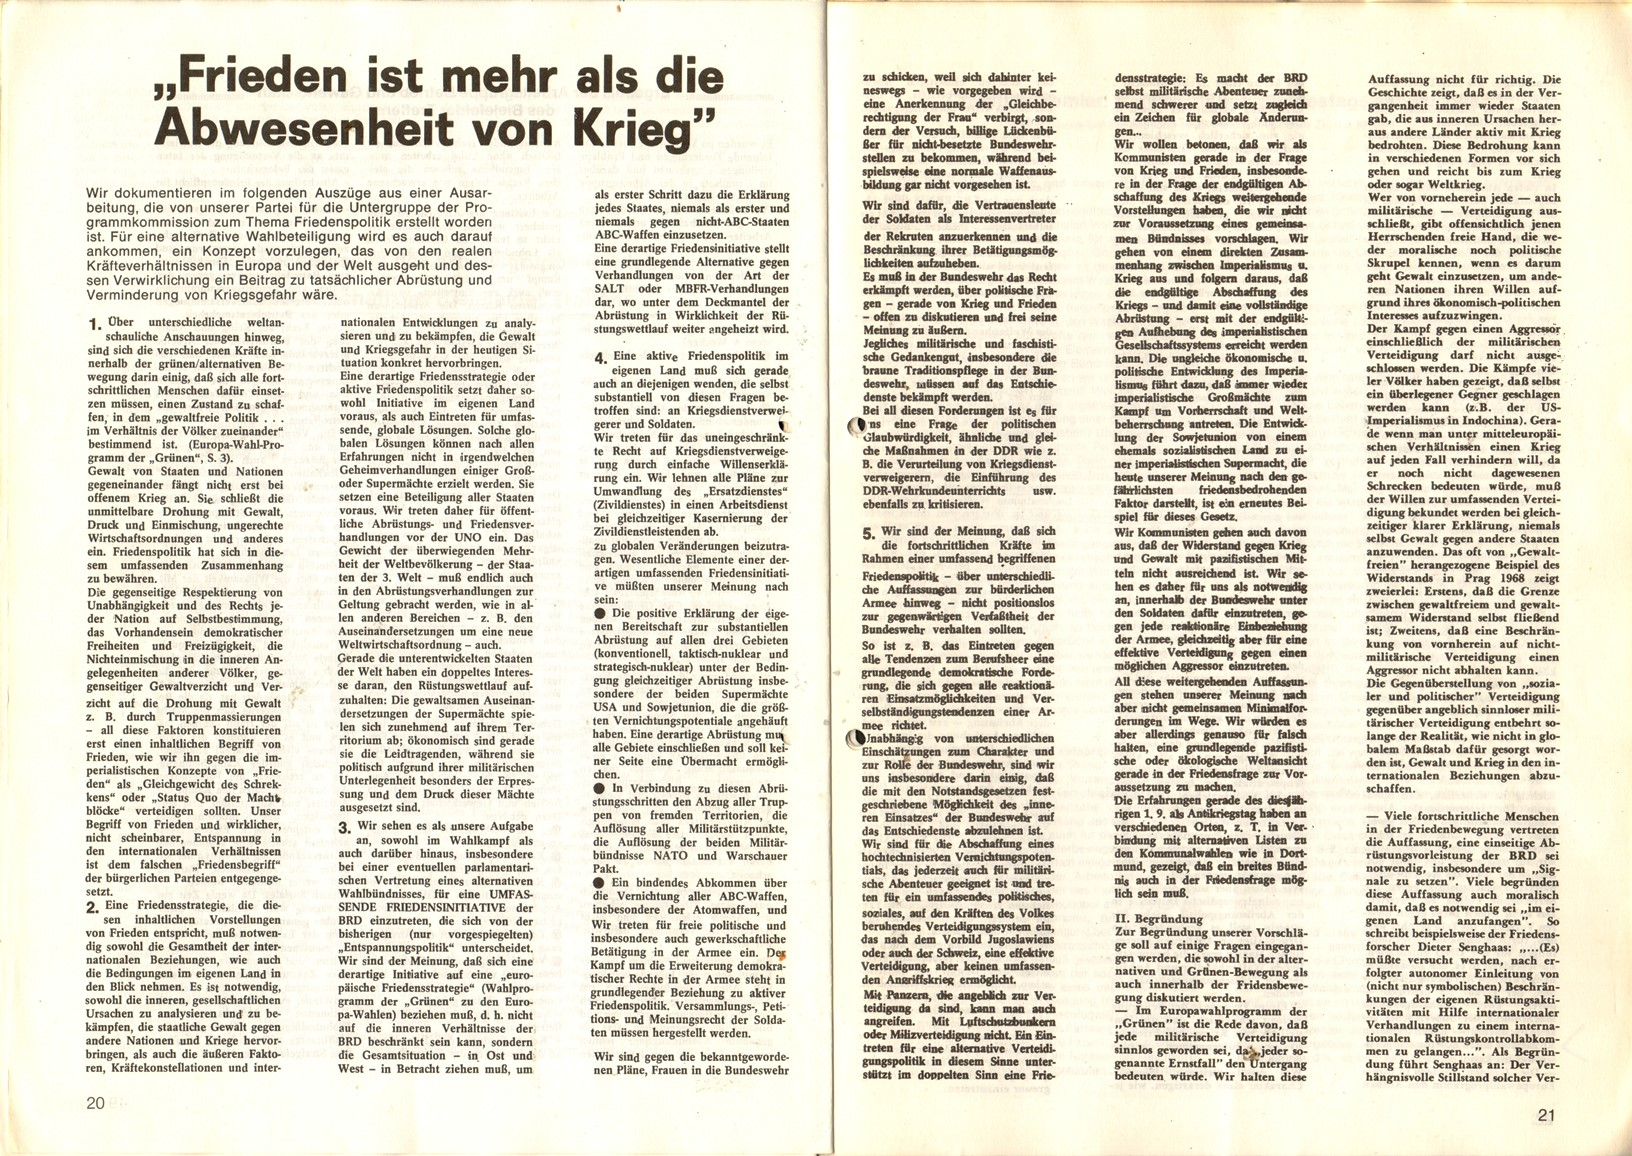 KPDAO_1979_Diskussion_Bundestagswahlen_1980_11